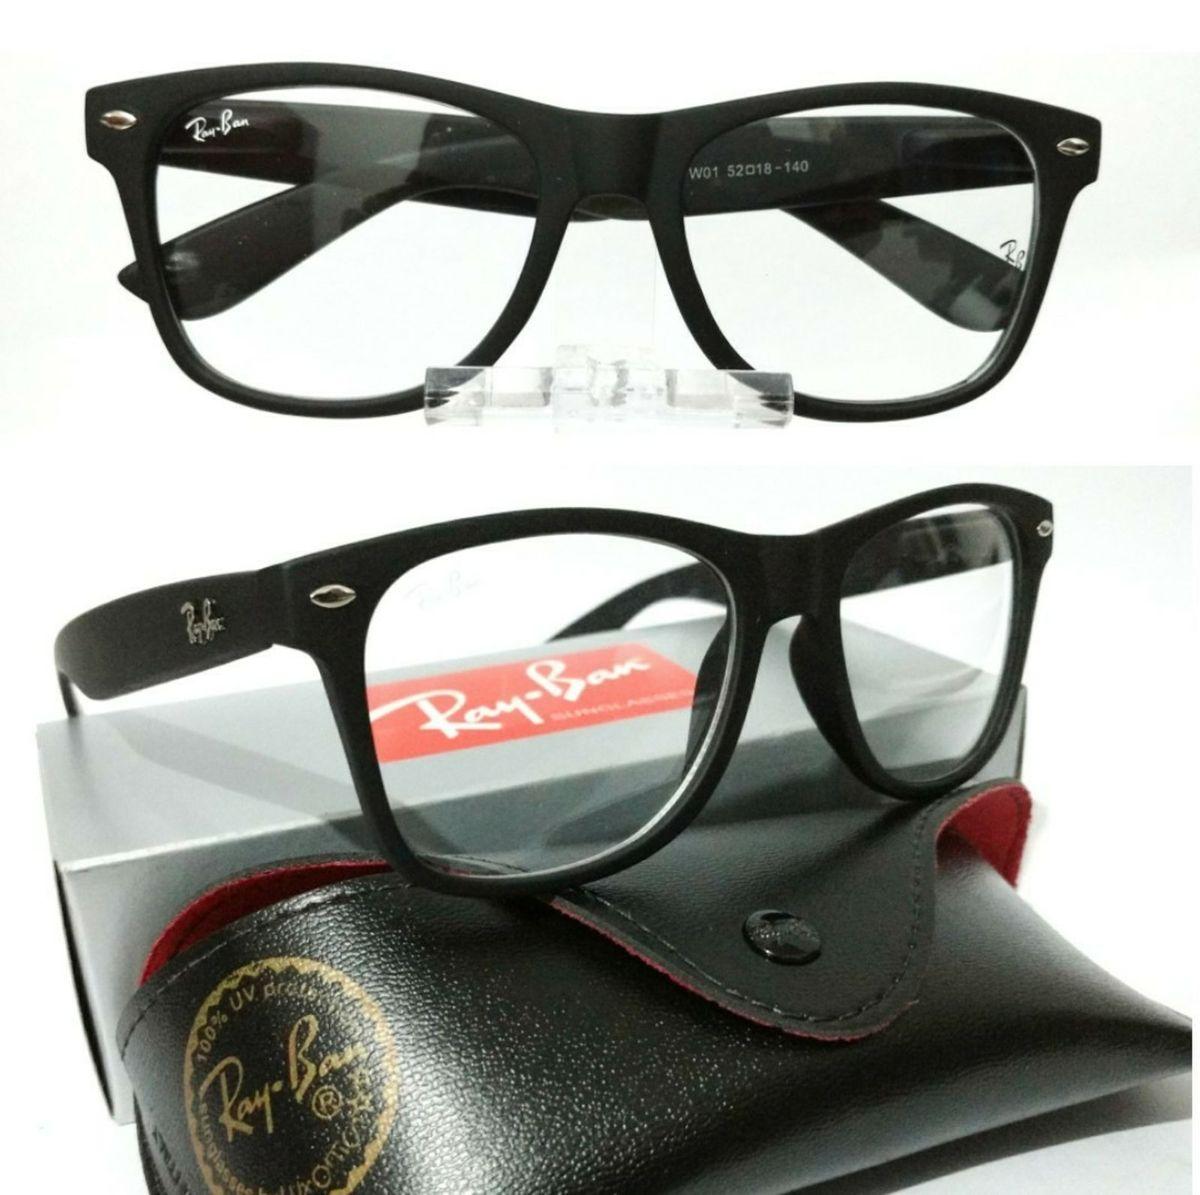 ... para óculos de grau wayfarer fosco quadrado masculino e feminino -  óculos sem-marca  Óculos De Sol Redondo Haste Mola Vintage Gotico Retro  Lennon ... ab4d466f5c